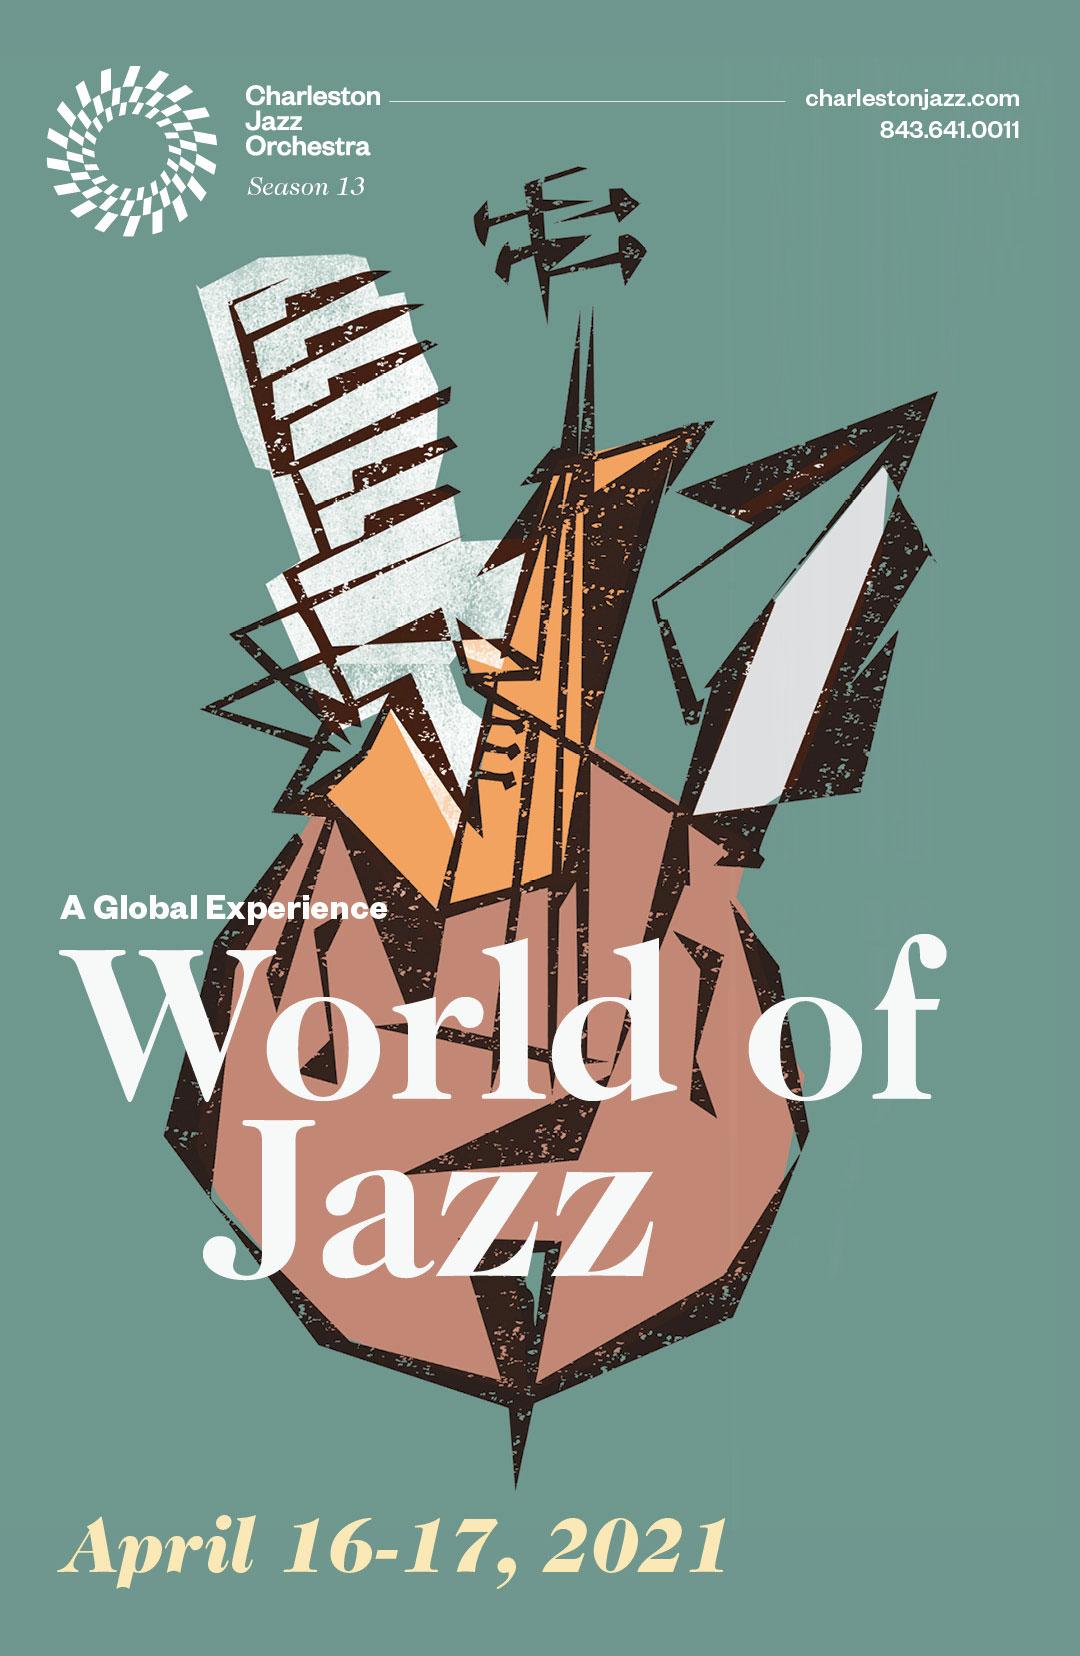 World of Jazz Poster